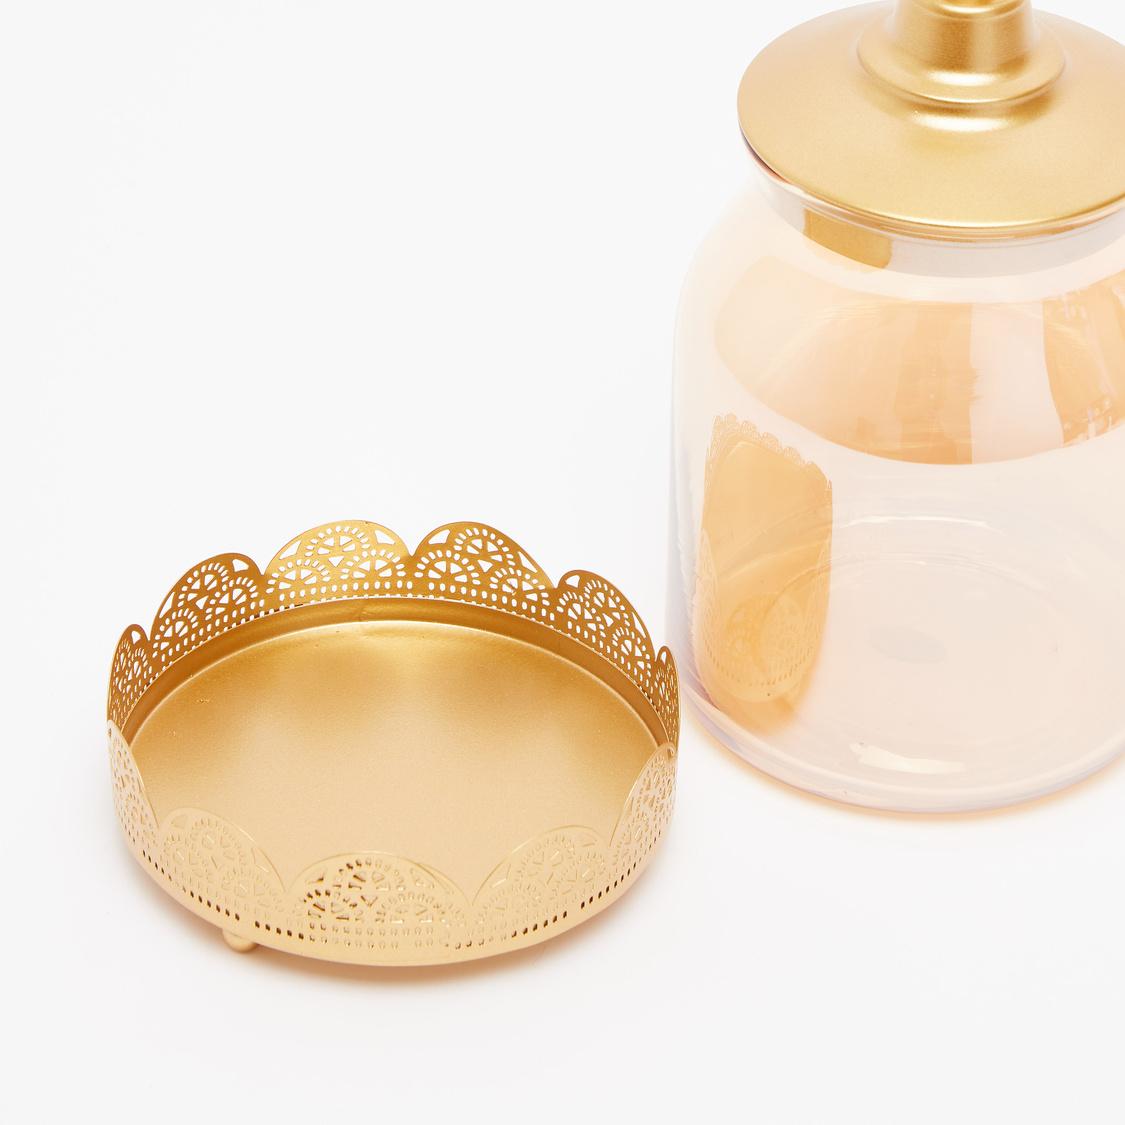 Decorative Tea Light Candle Jar with Lid - 12x27 cms